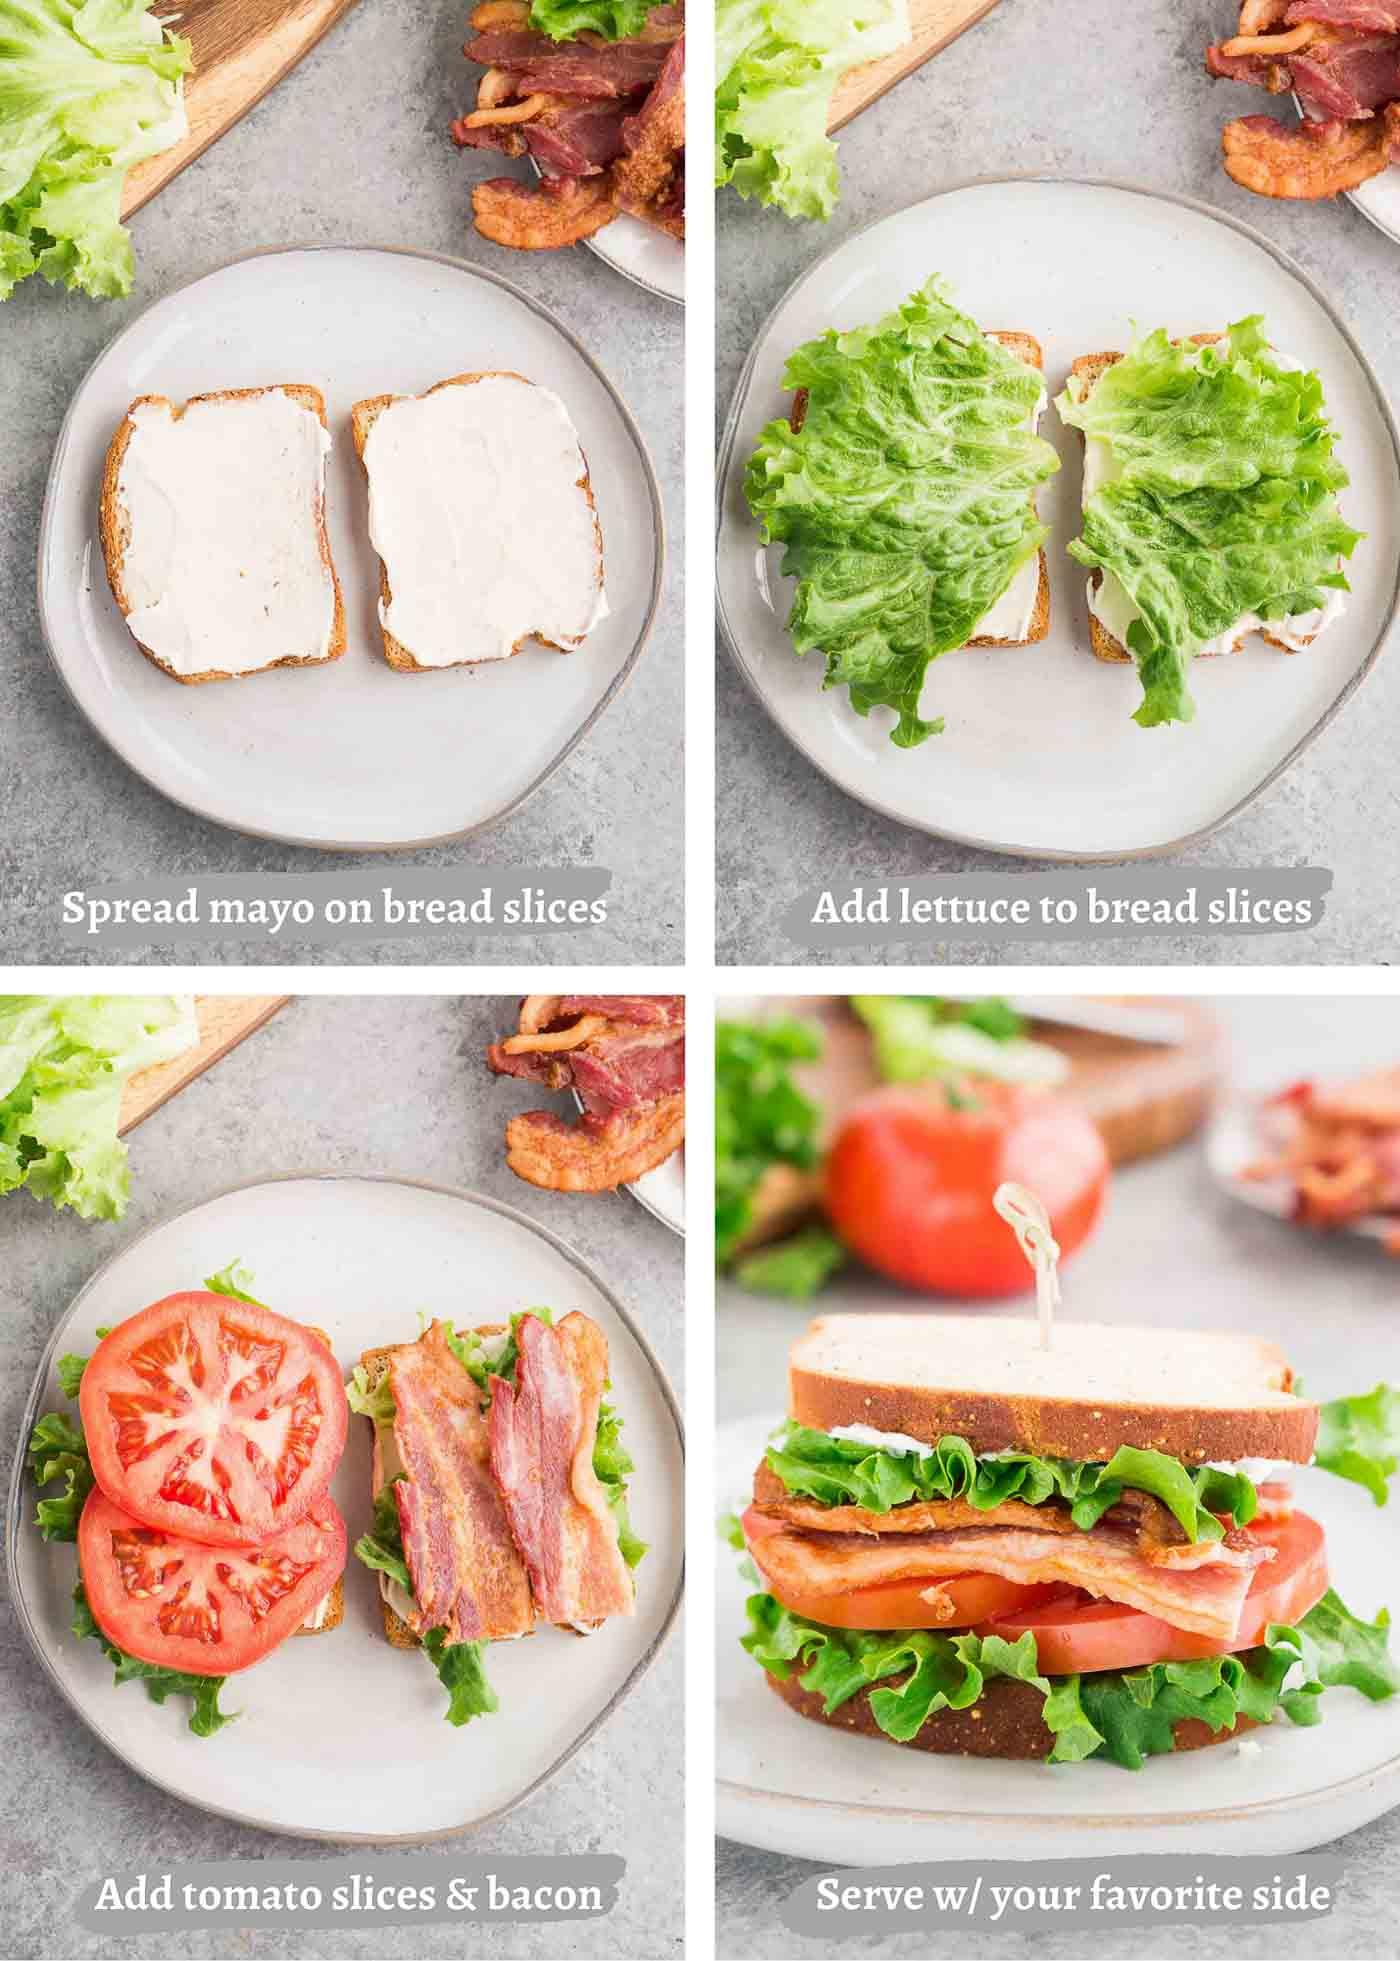 process shot of making BLT sandwich